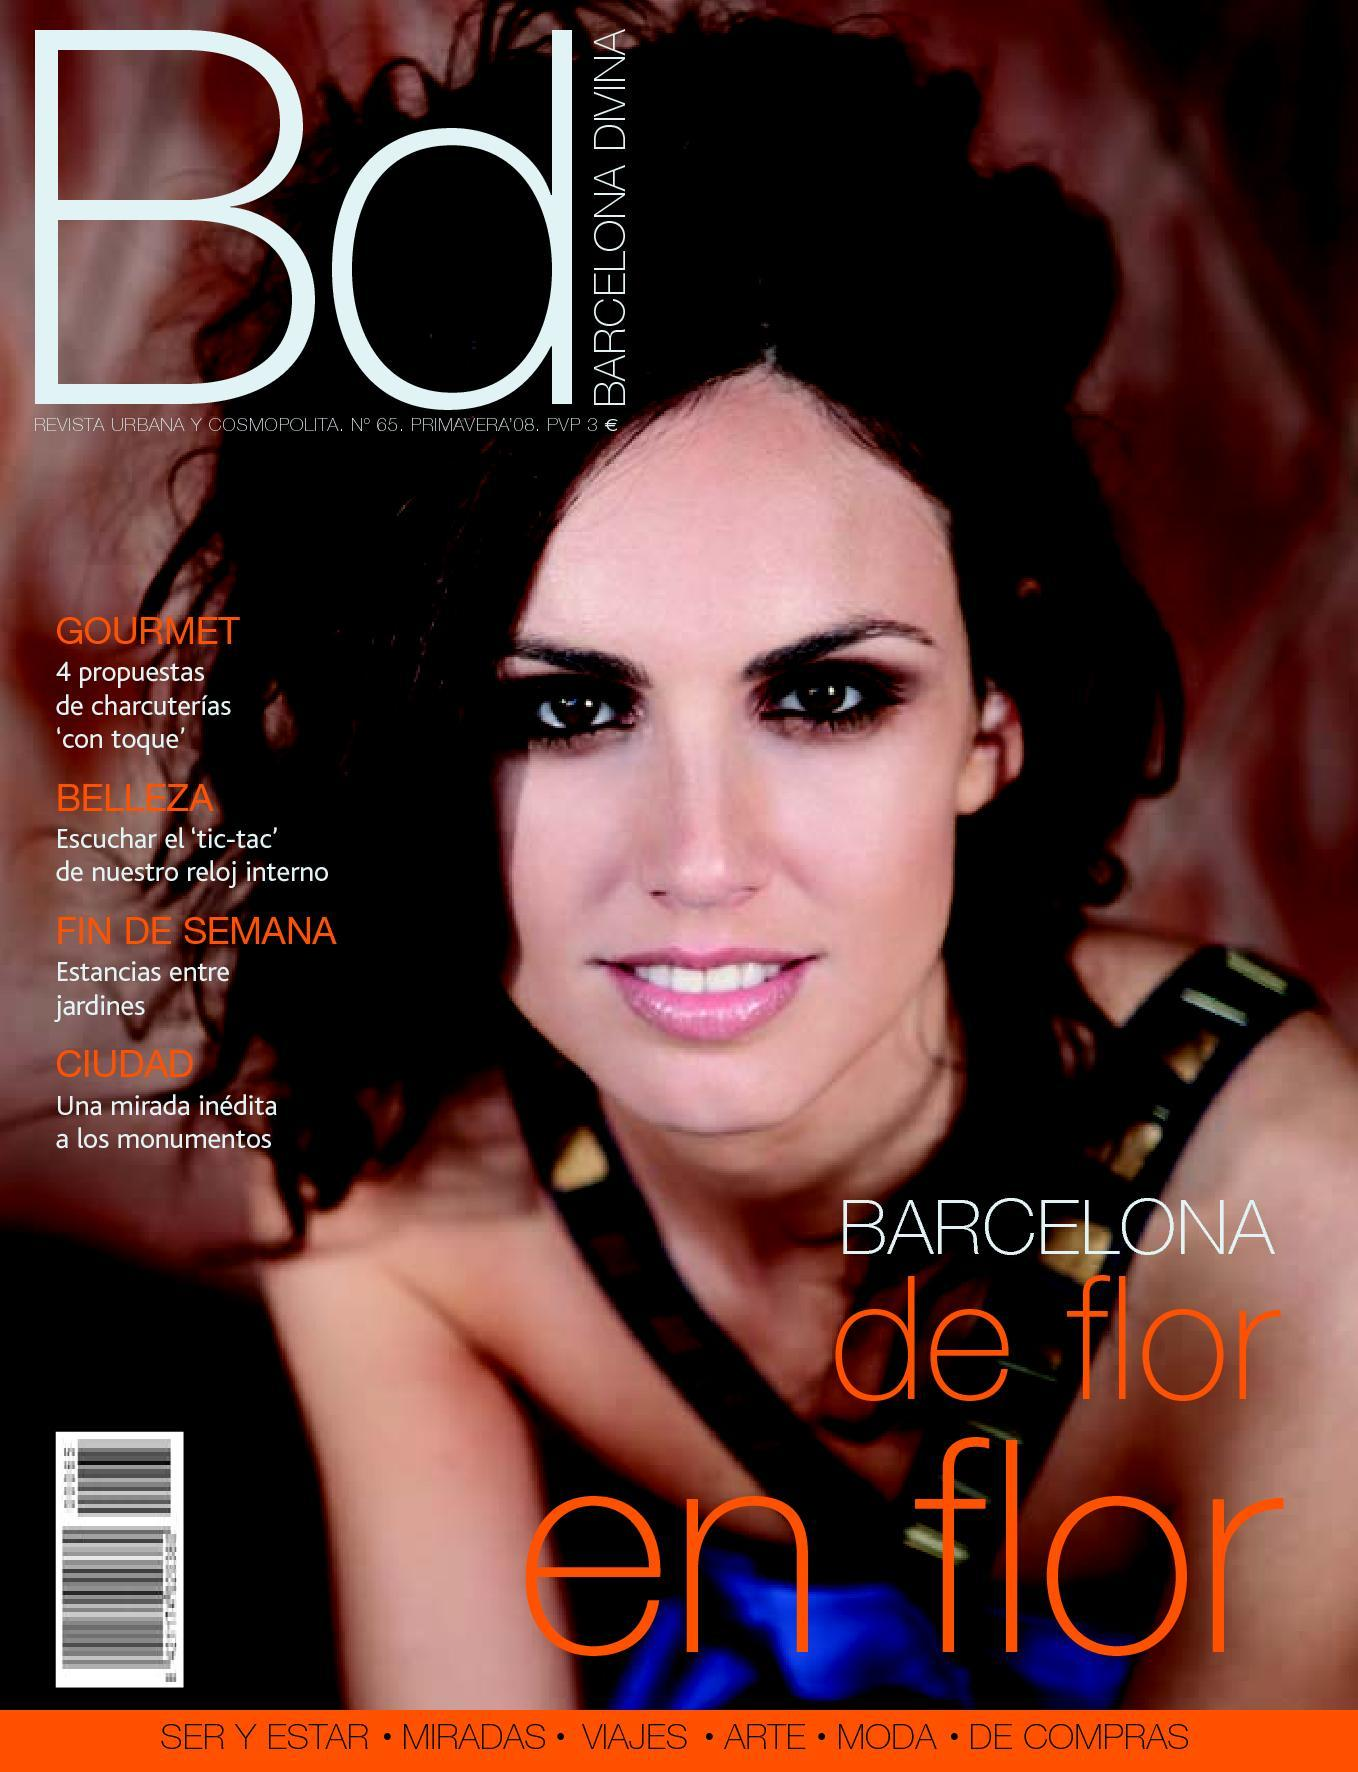 Barcelona divina - Nº65, PRIMAVERA 2008 by Synergias de Prensa, S.L. ...